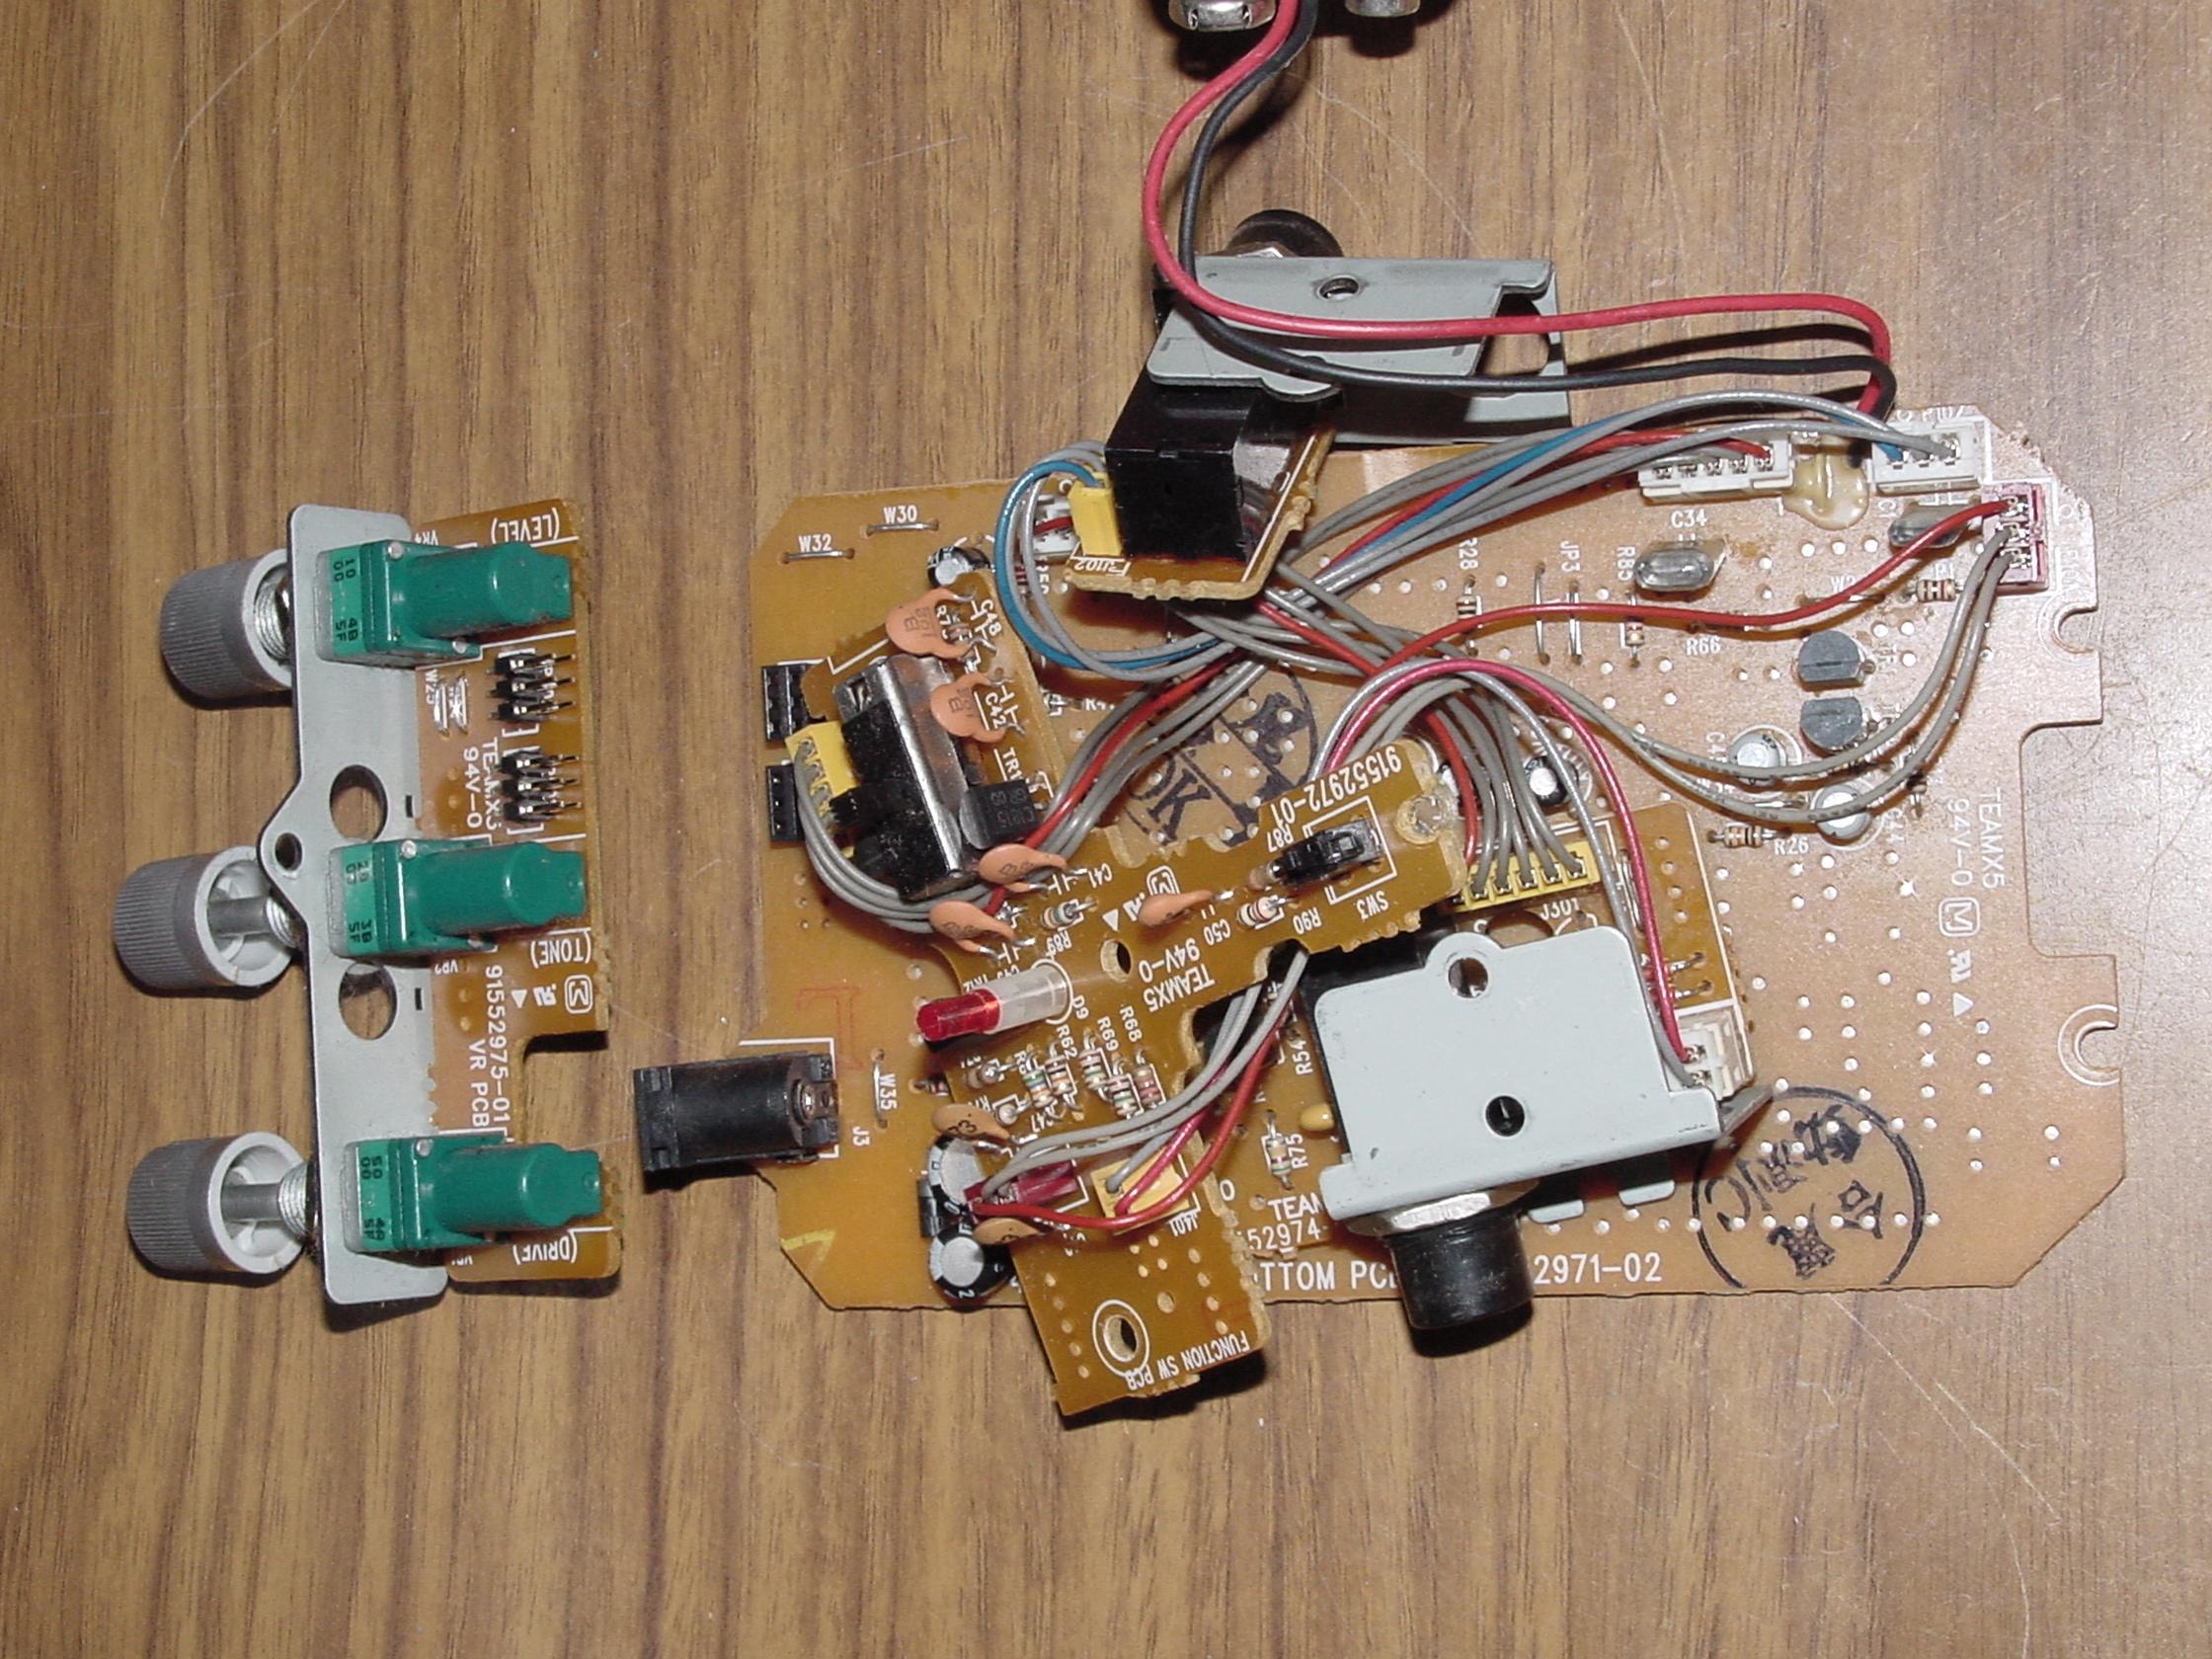 Ibanez TS7 TubeScreamer 分解検証&回路図|ギター・エフェクターの自作